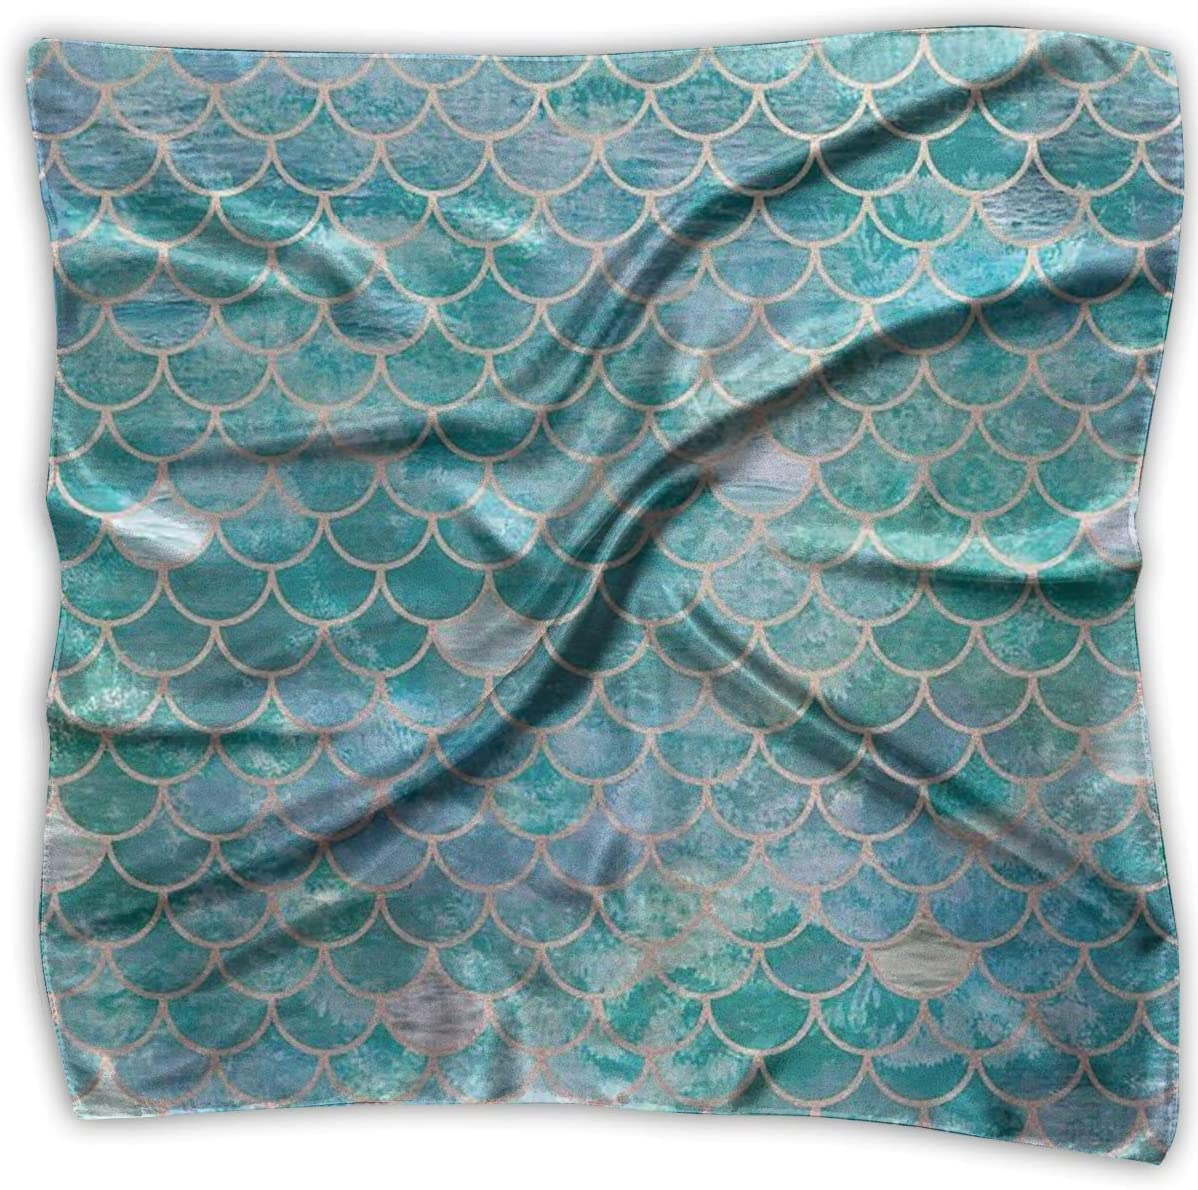 WFIRE Fish Scale Print Square Handkerchiefs Scarf Shawl Bandanas Headscarf Neckerchief